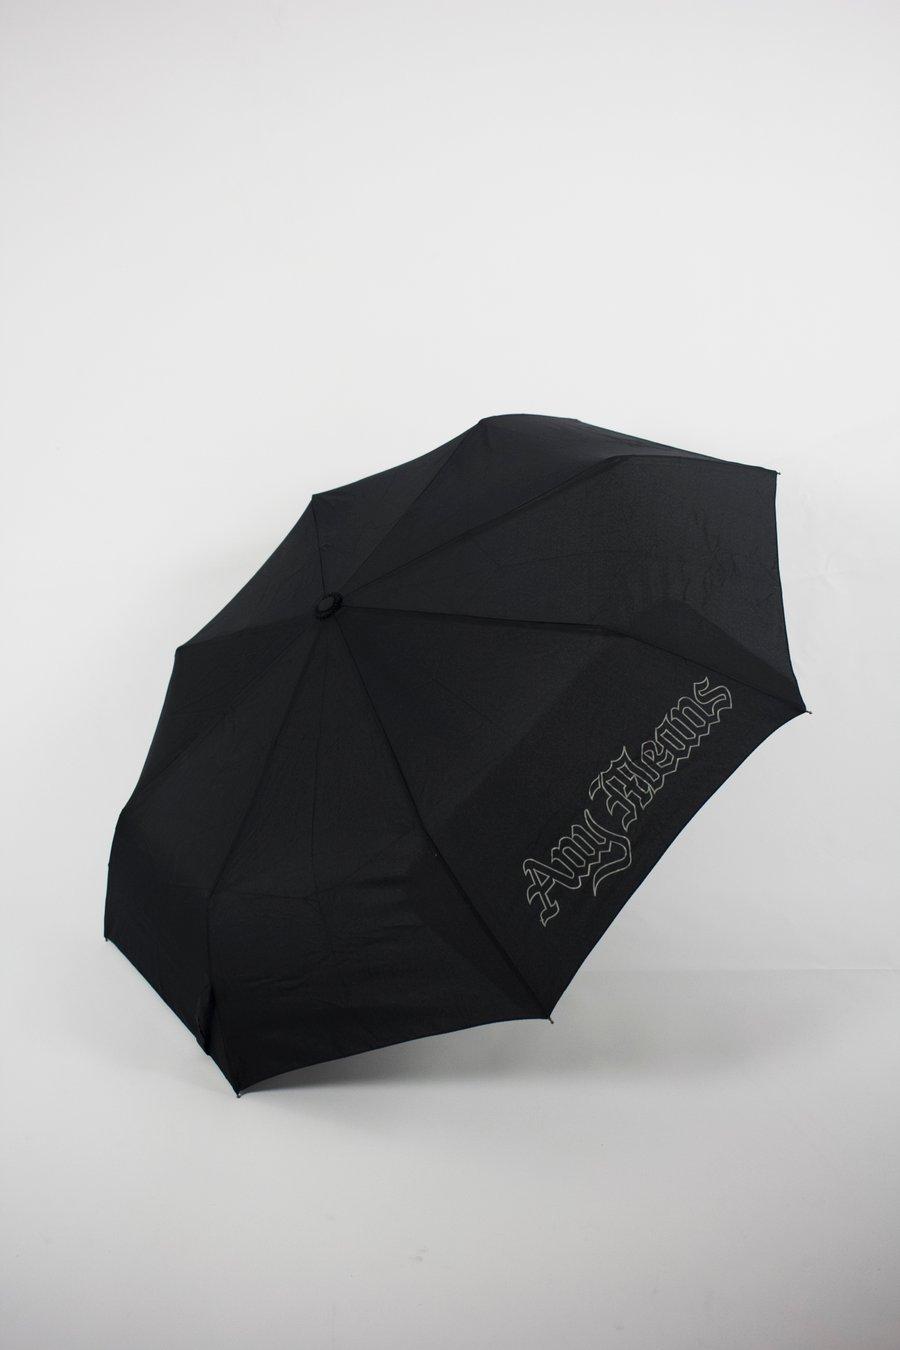 Image of Compact Umbrella in Black